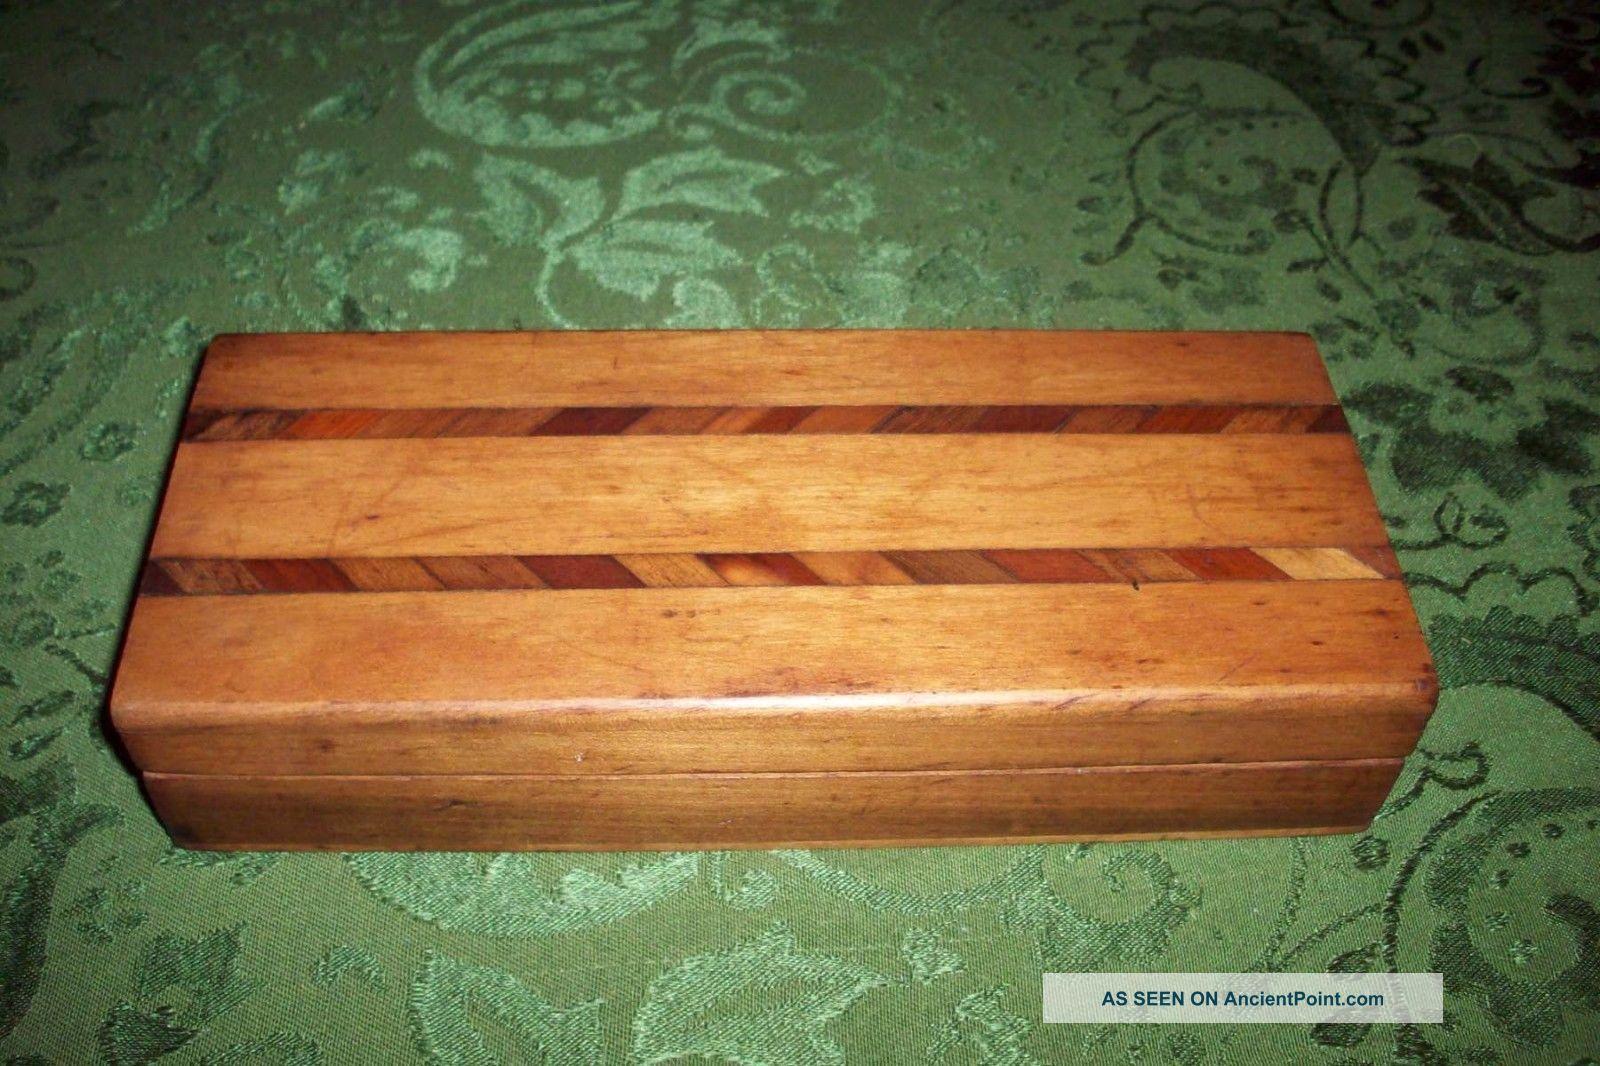 Vintage Art Deco Wooden Jewerly Box V/good Art Deco photo